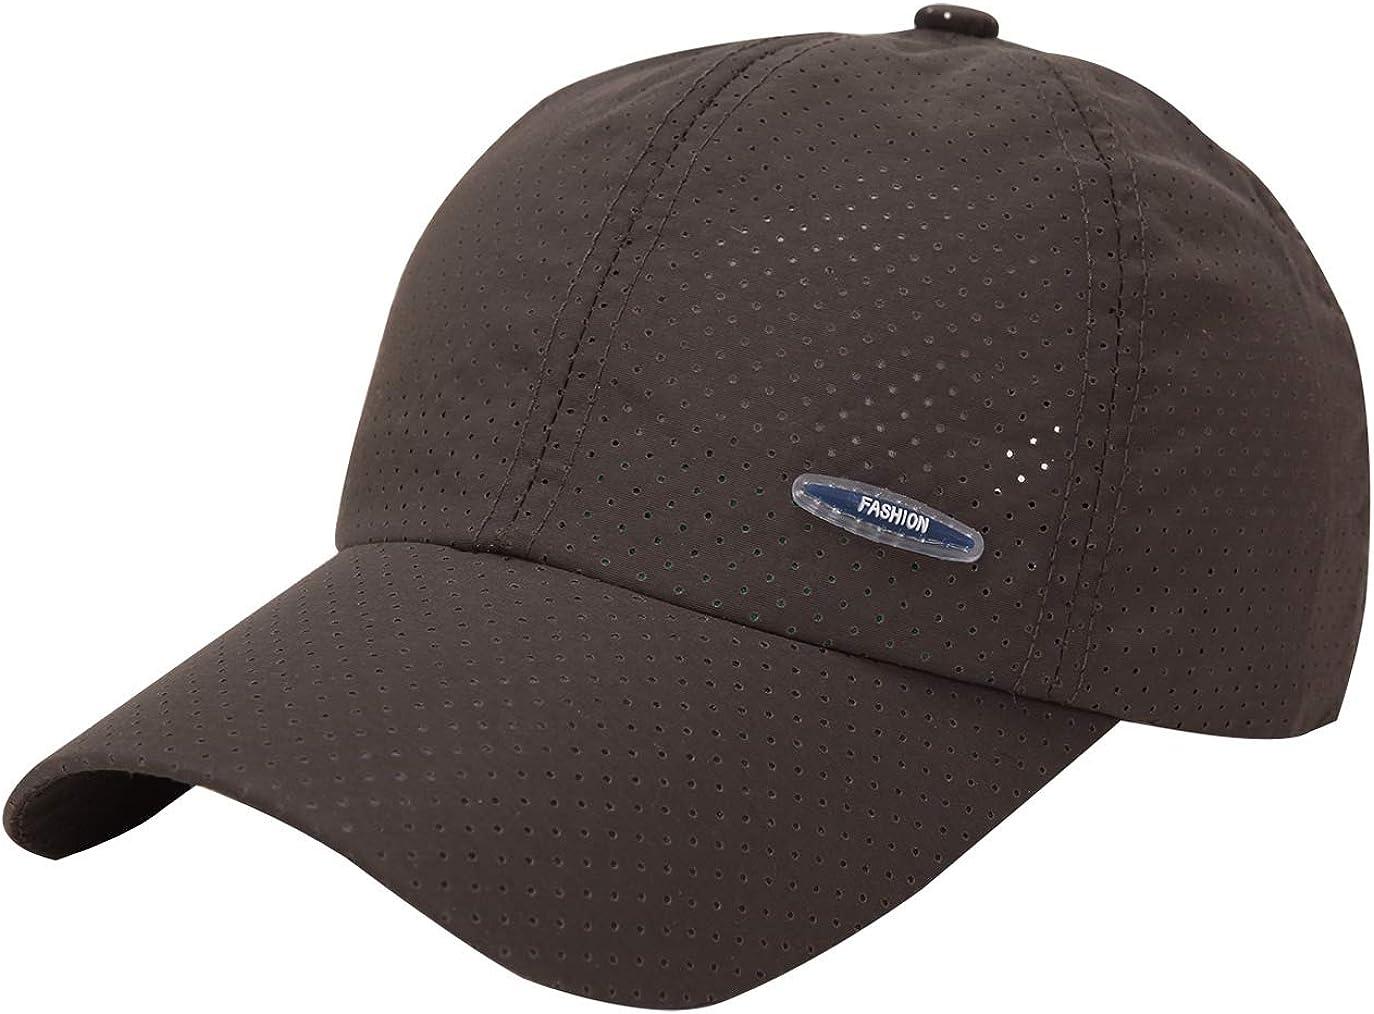 Ohrwurm Trucker Hat Quick Dry Breathable Mesh UPF 50+ Cap Adjustable Baseball Cap